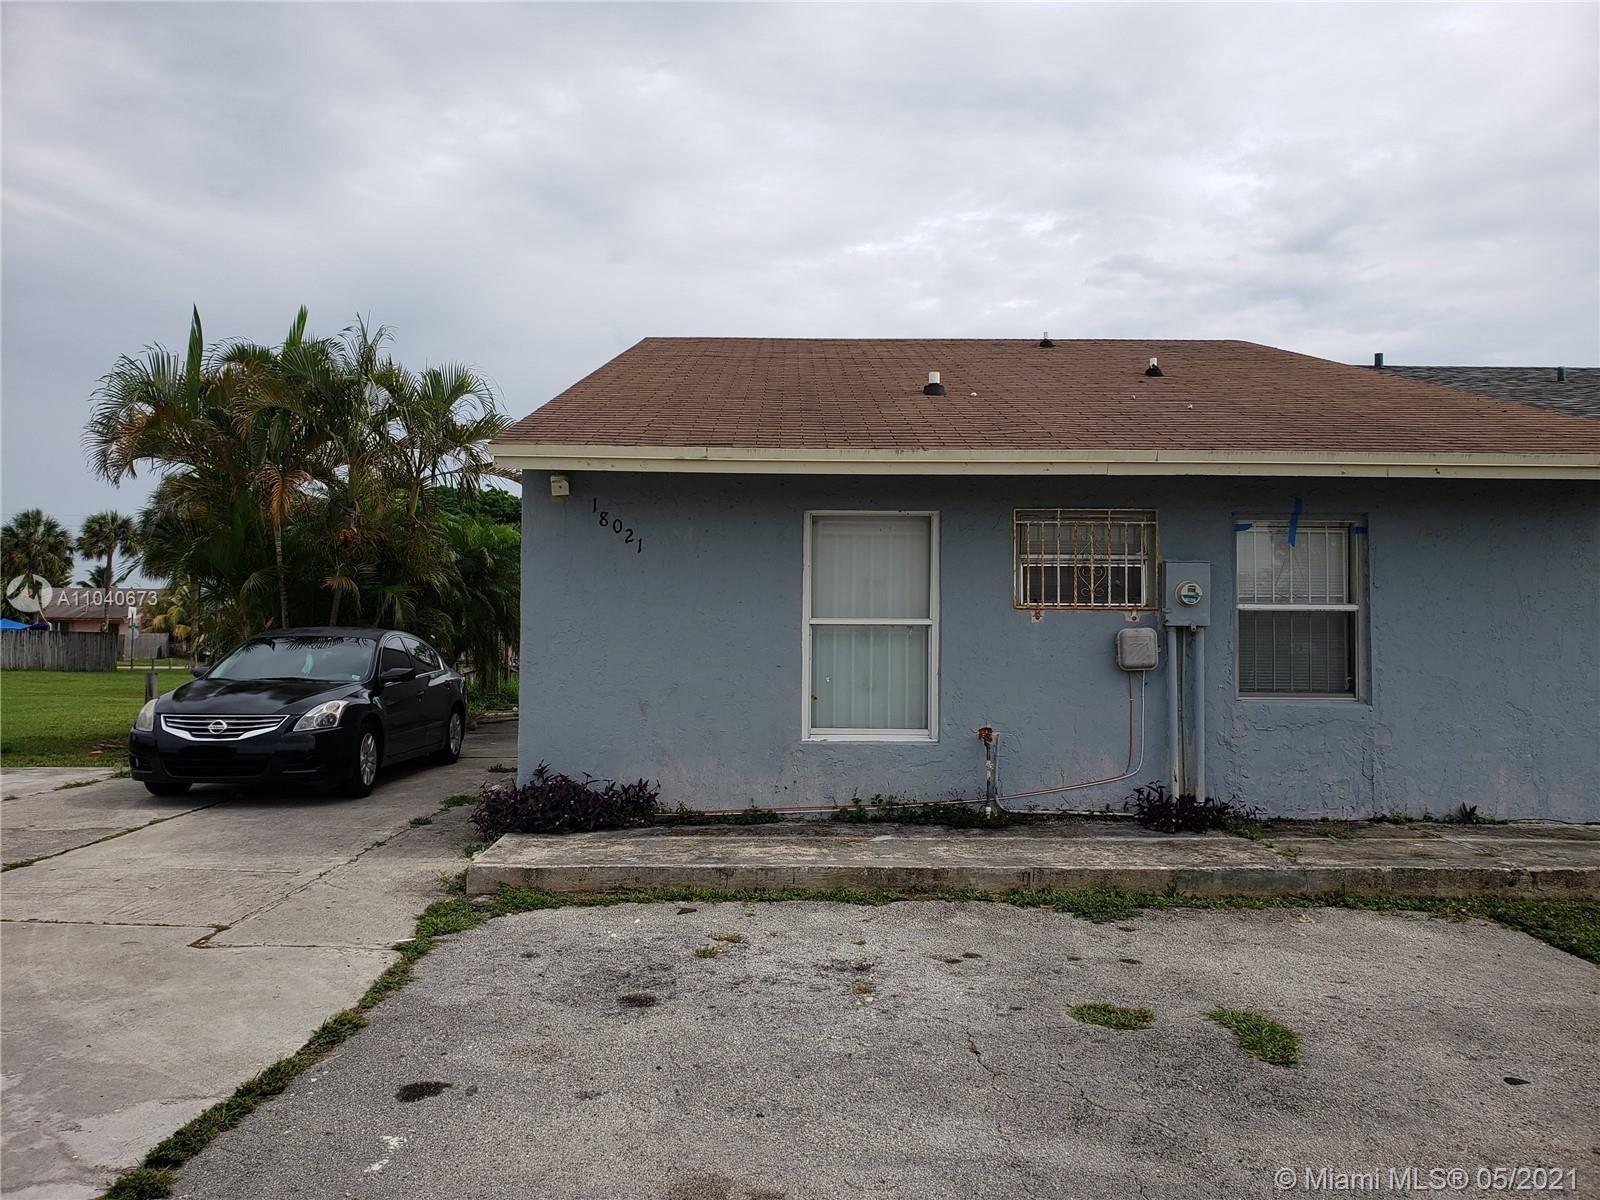 18021 NW 41st Pl #18021, Miami Gardens, FL 33055 - #: A11040673